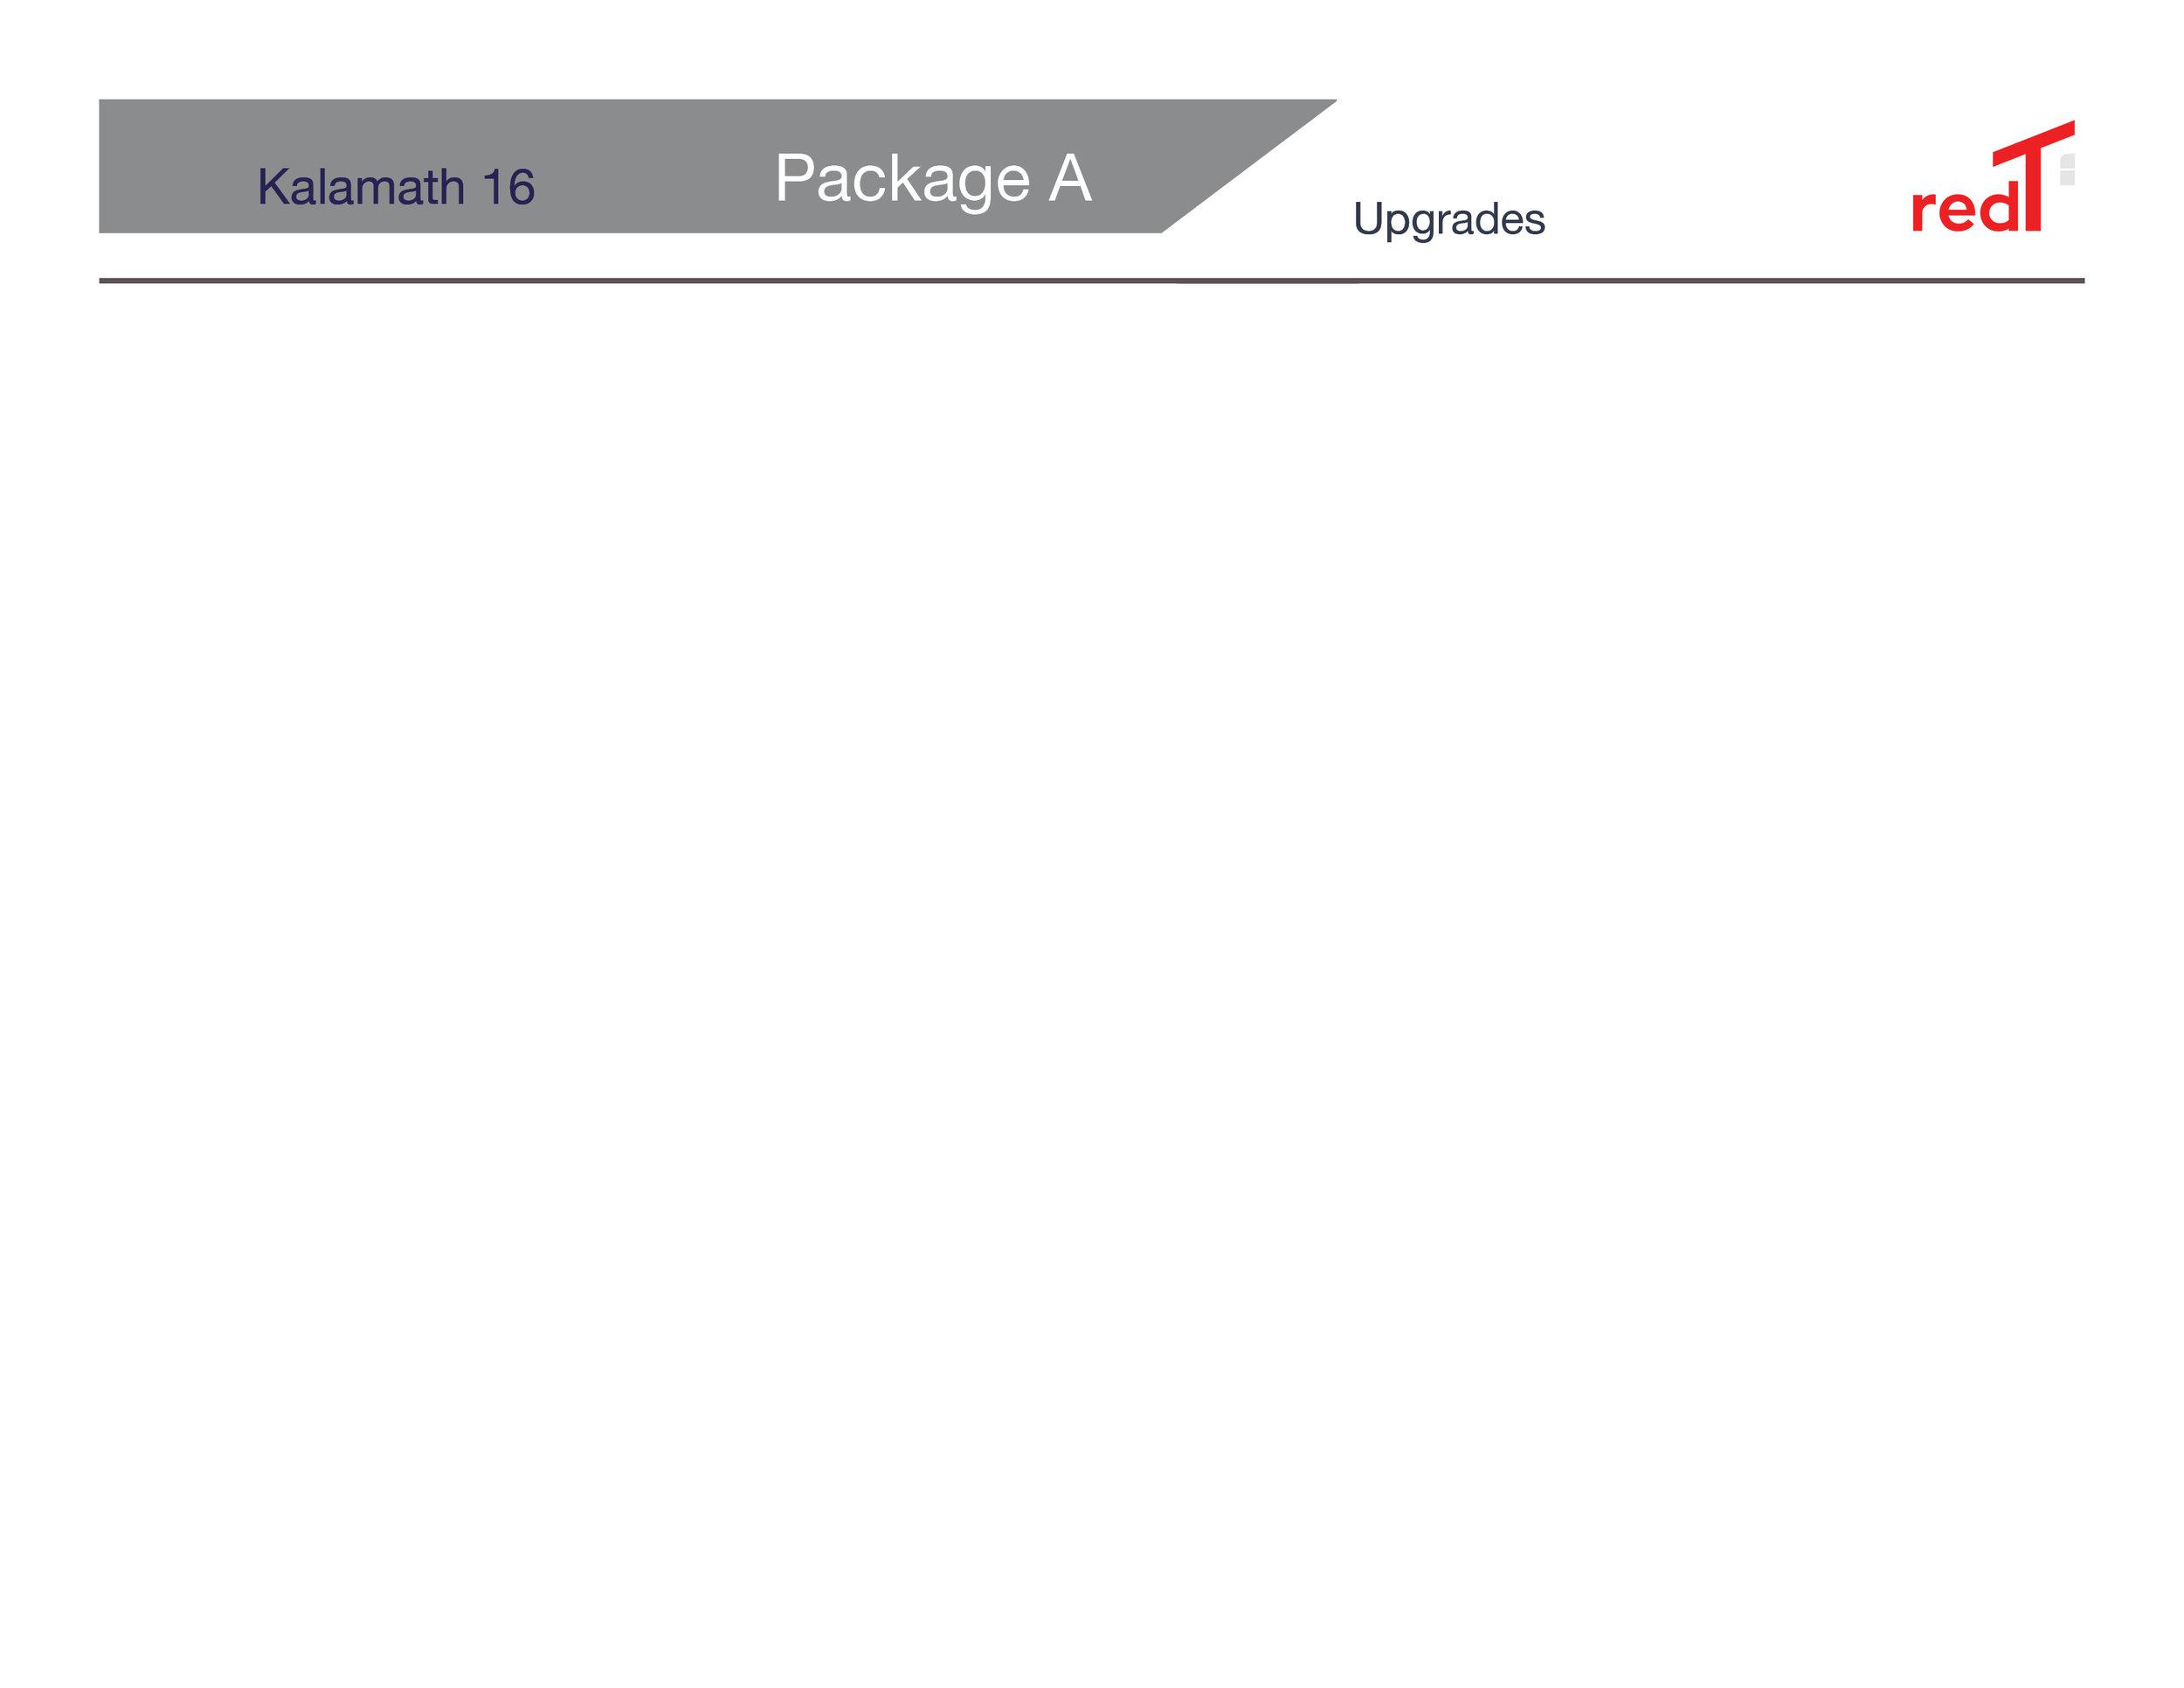 Kalamath Package A new.jpg